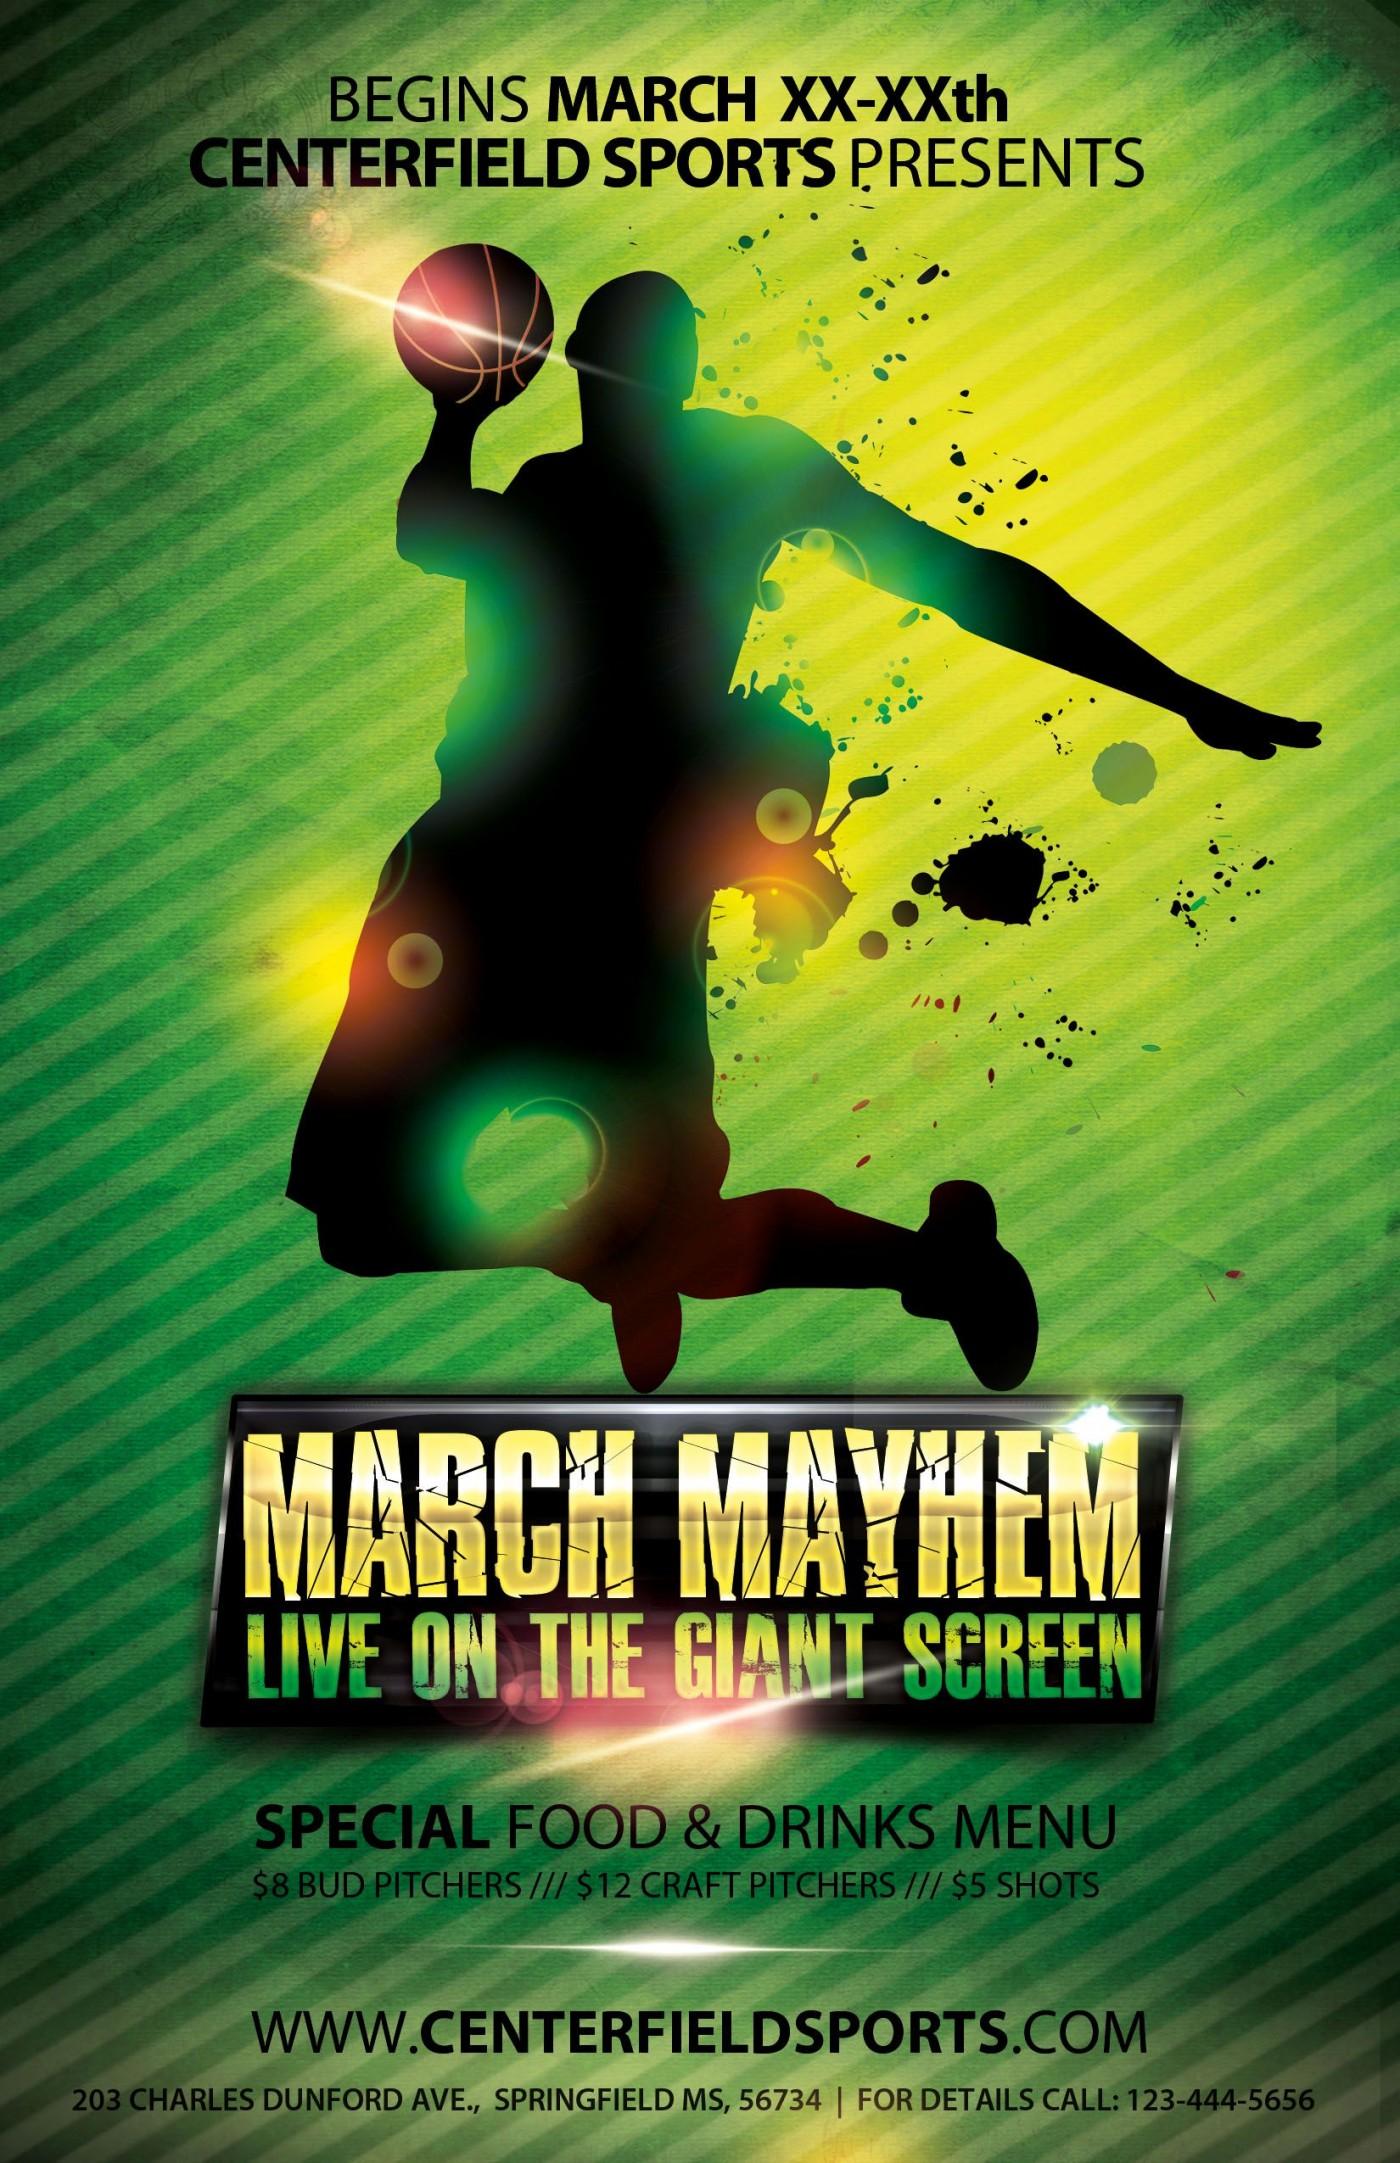 004 Impressive Basketball Flyer Template Free Sample  Brochure Tryout Camp1400